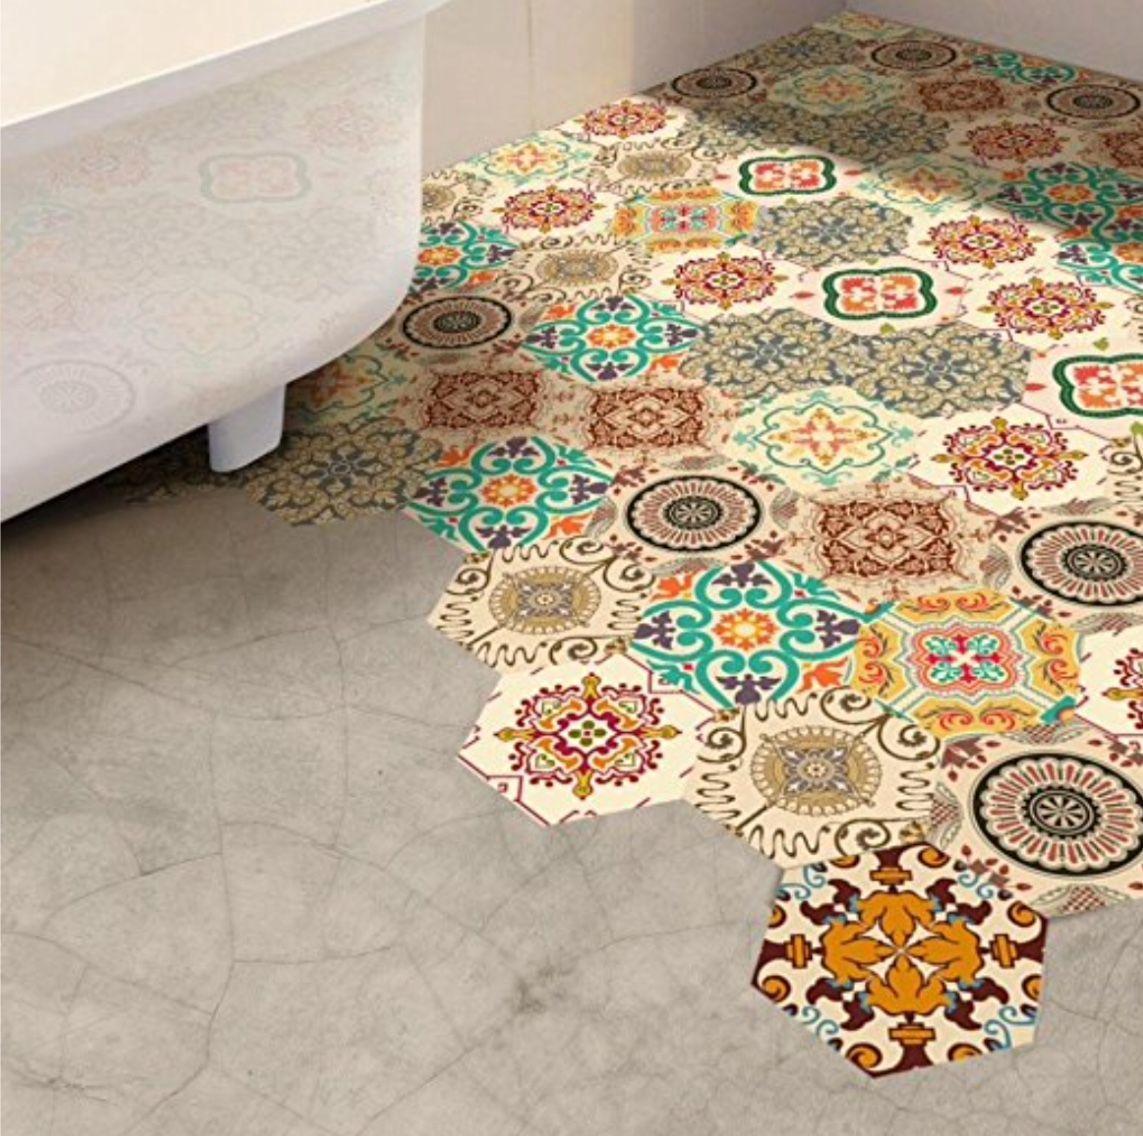 Self Adhesive Tile Floor Wall Sticker Paper DIY Home Kitchen RoomDecor Vinyl UK